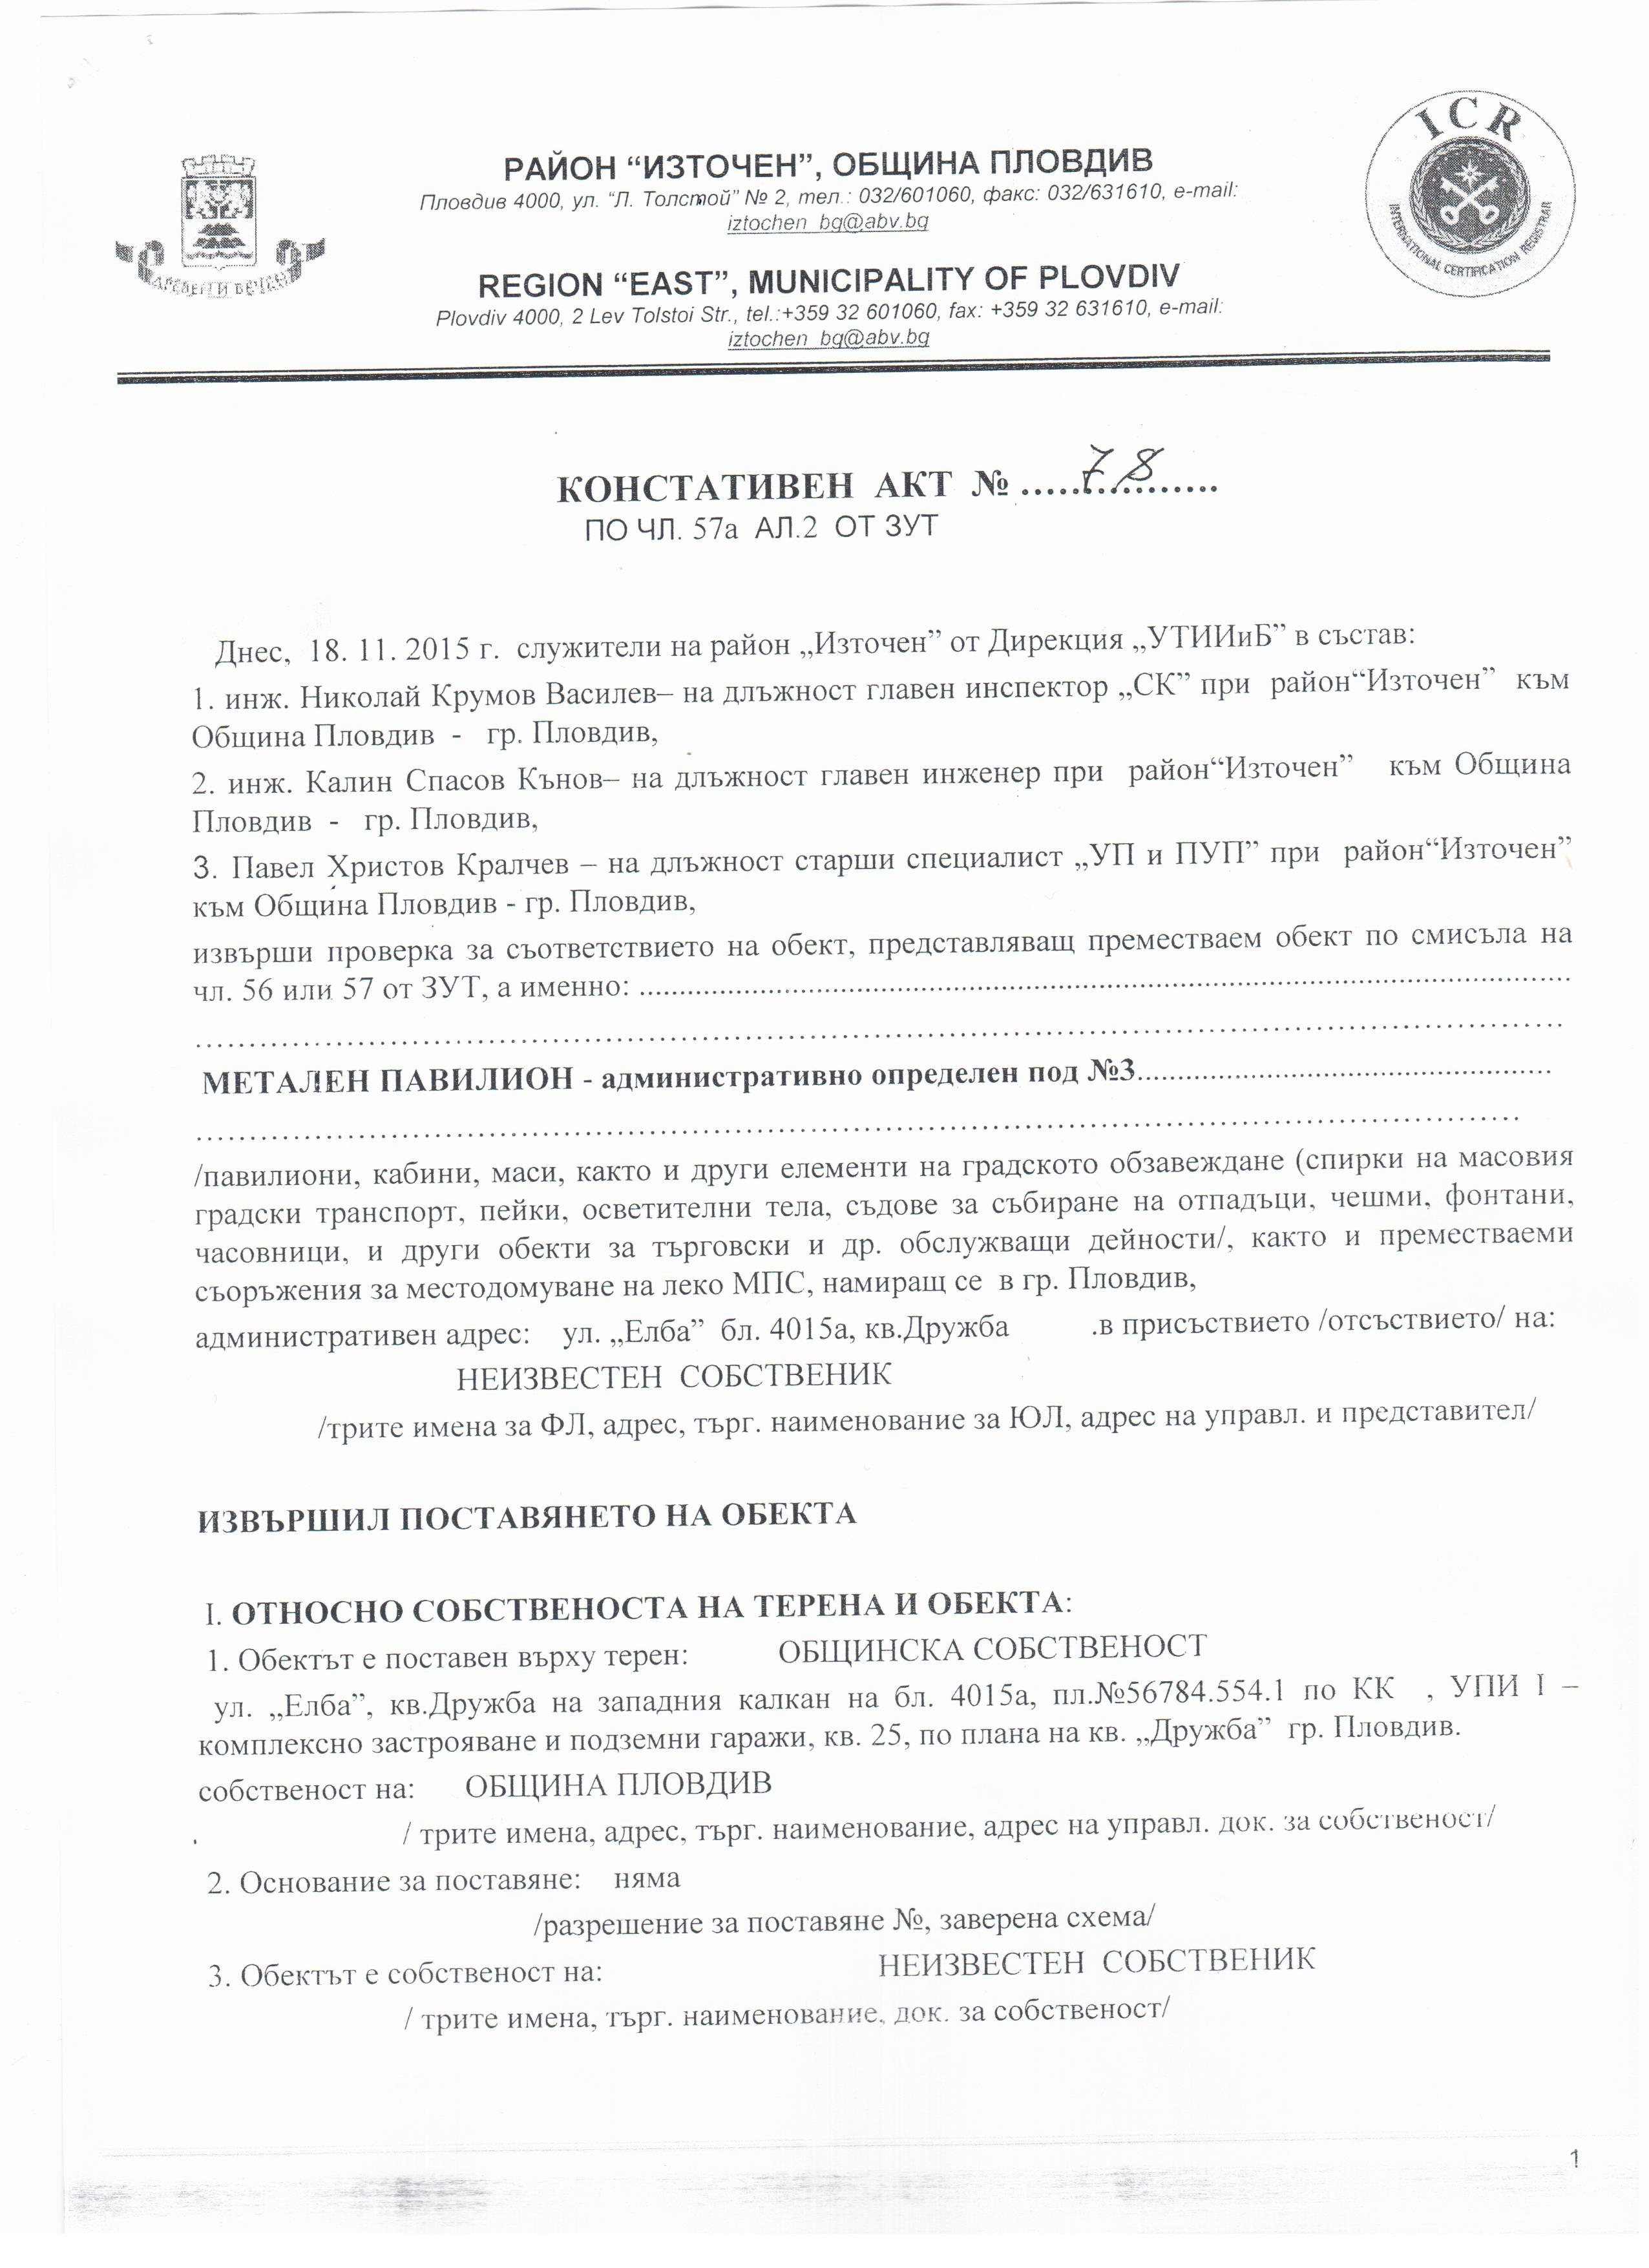 KONSTATIVEN_AKT_№78